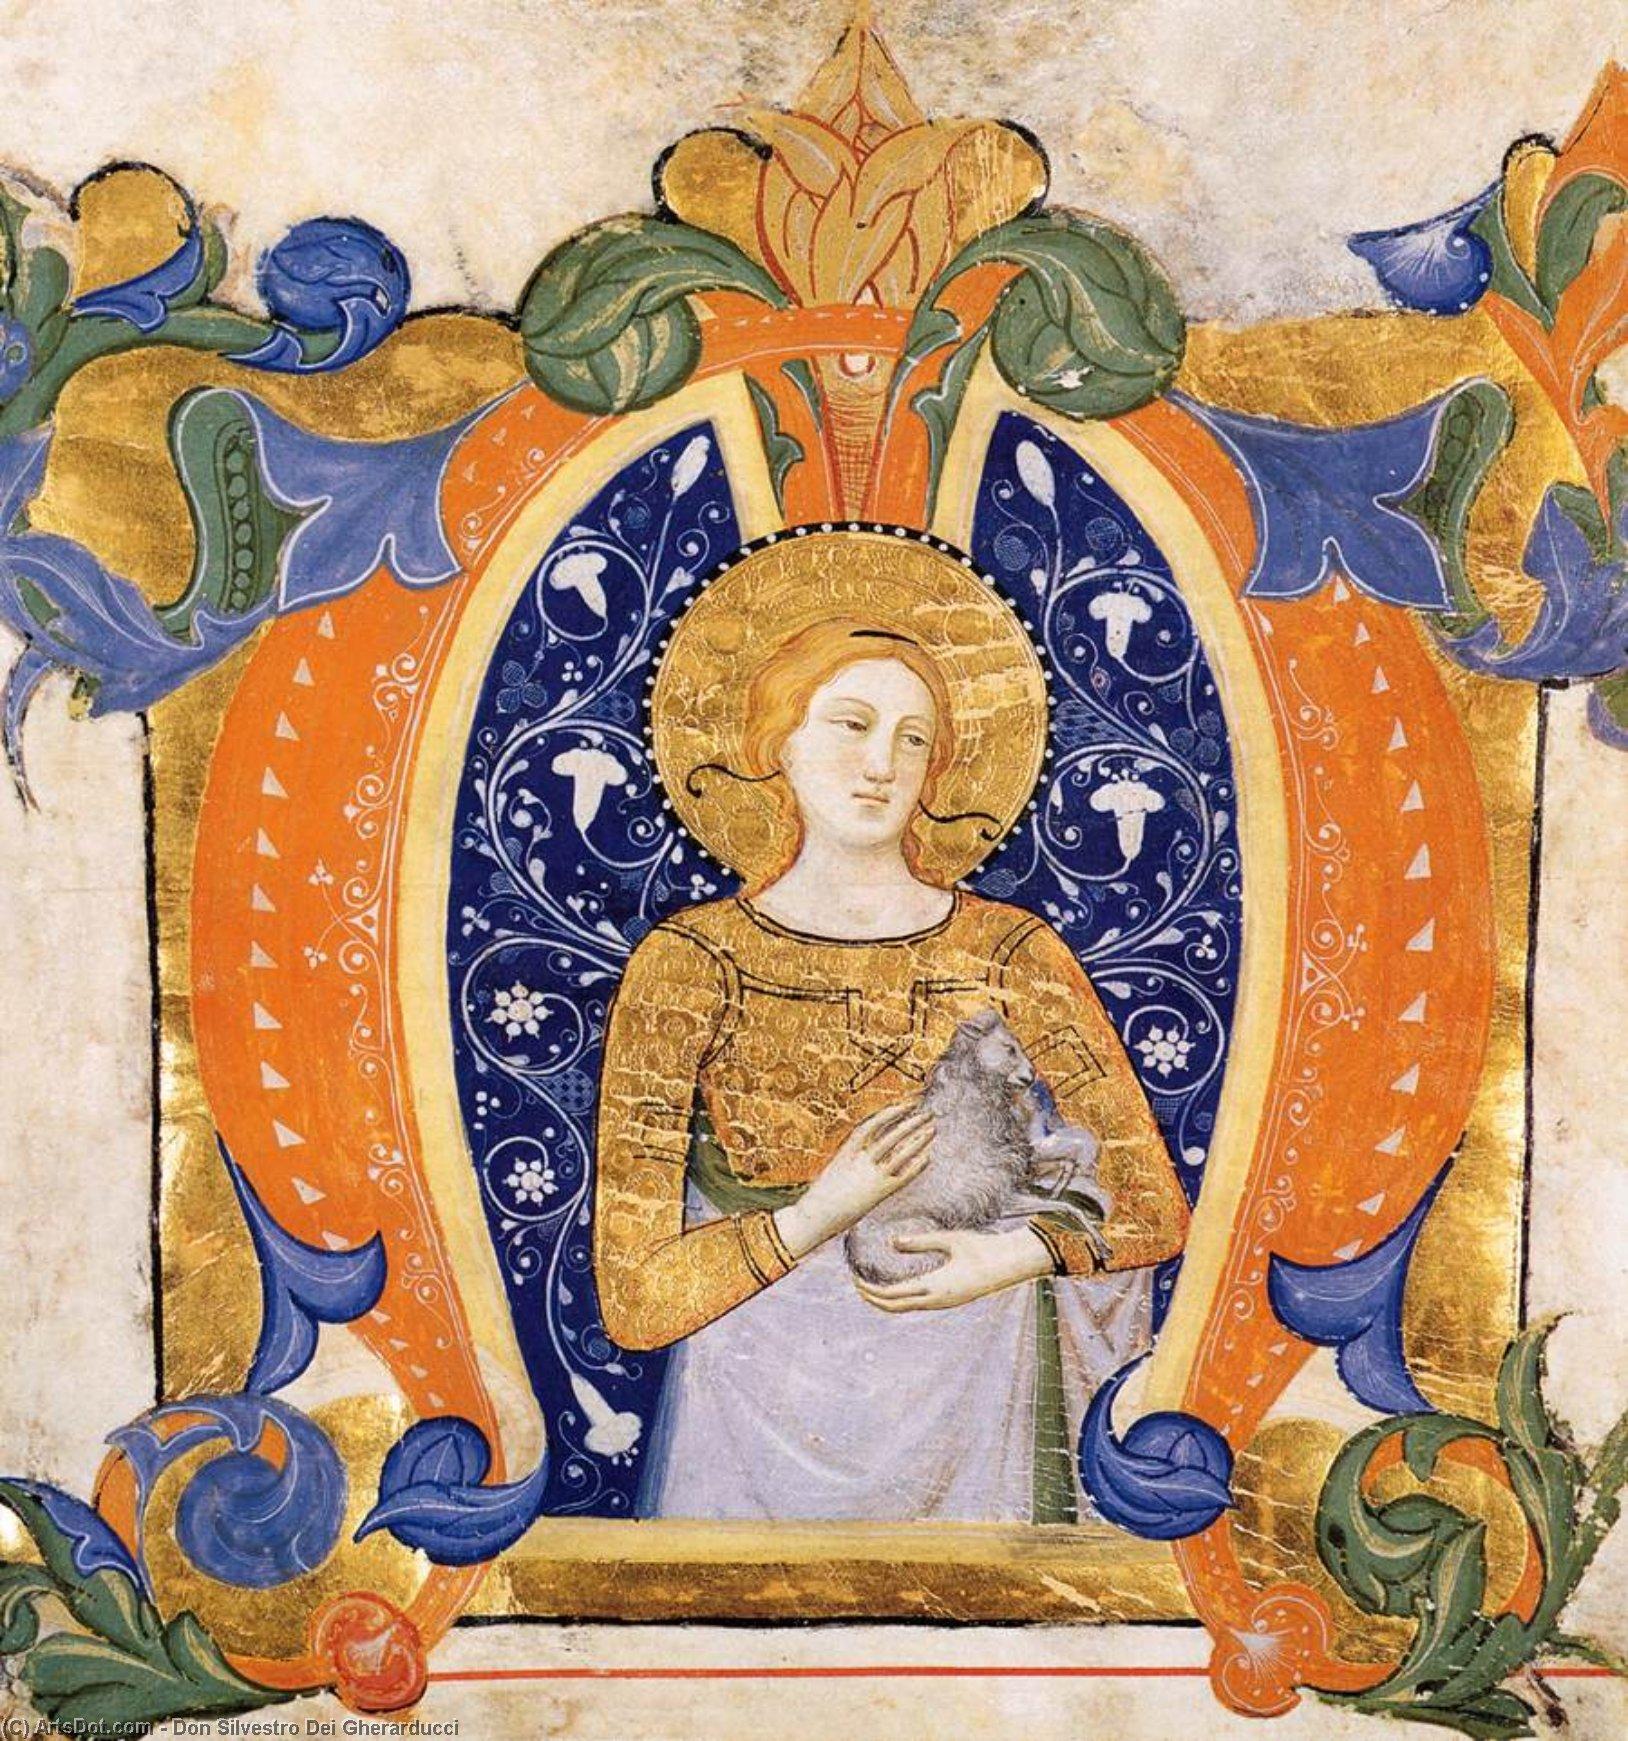 WikiOO.org - Enciklopedija dailės - Tapyba, meno kuriniai Don Silvestro Dei Gherarducci - Gradual from Santa Maria degli Angeli (Folio 32v)